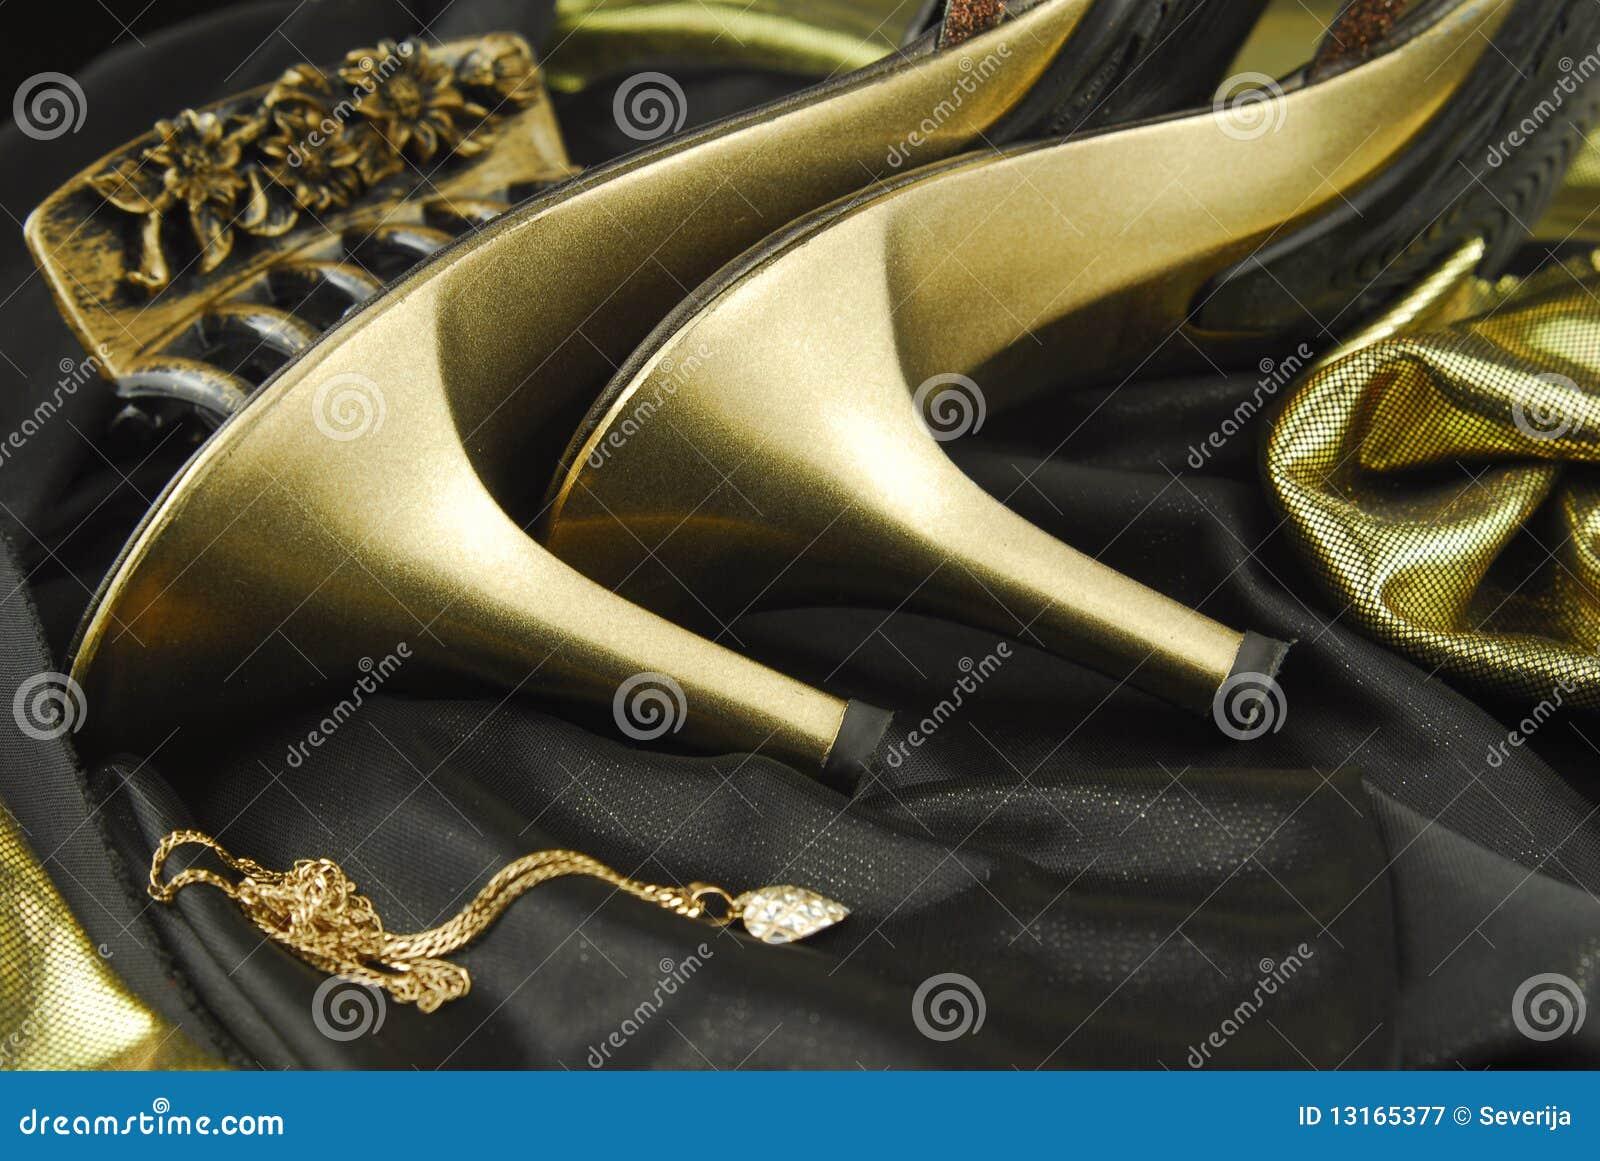 9454213f7ea βοηθητικά παπούτσια womans στοκ εικόνα. εικόνα από γοητεία - 13165377